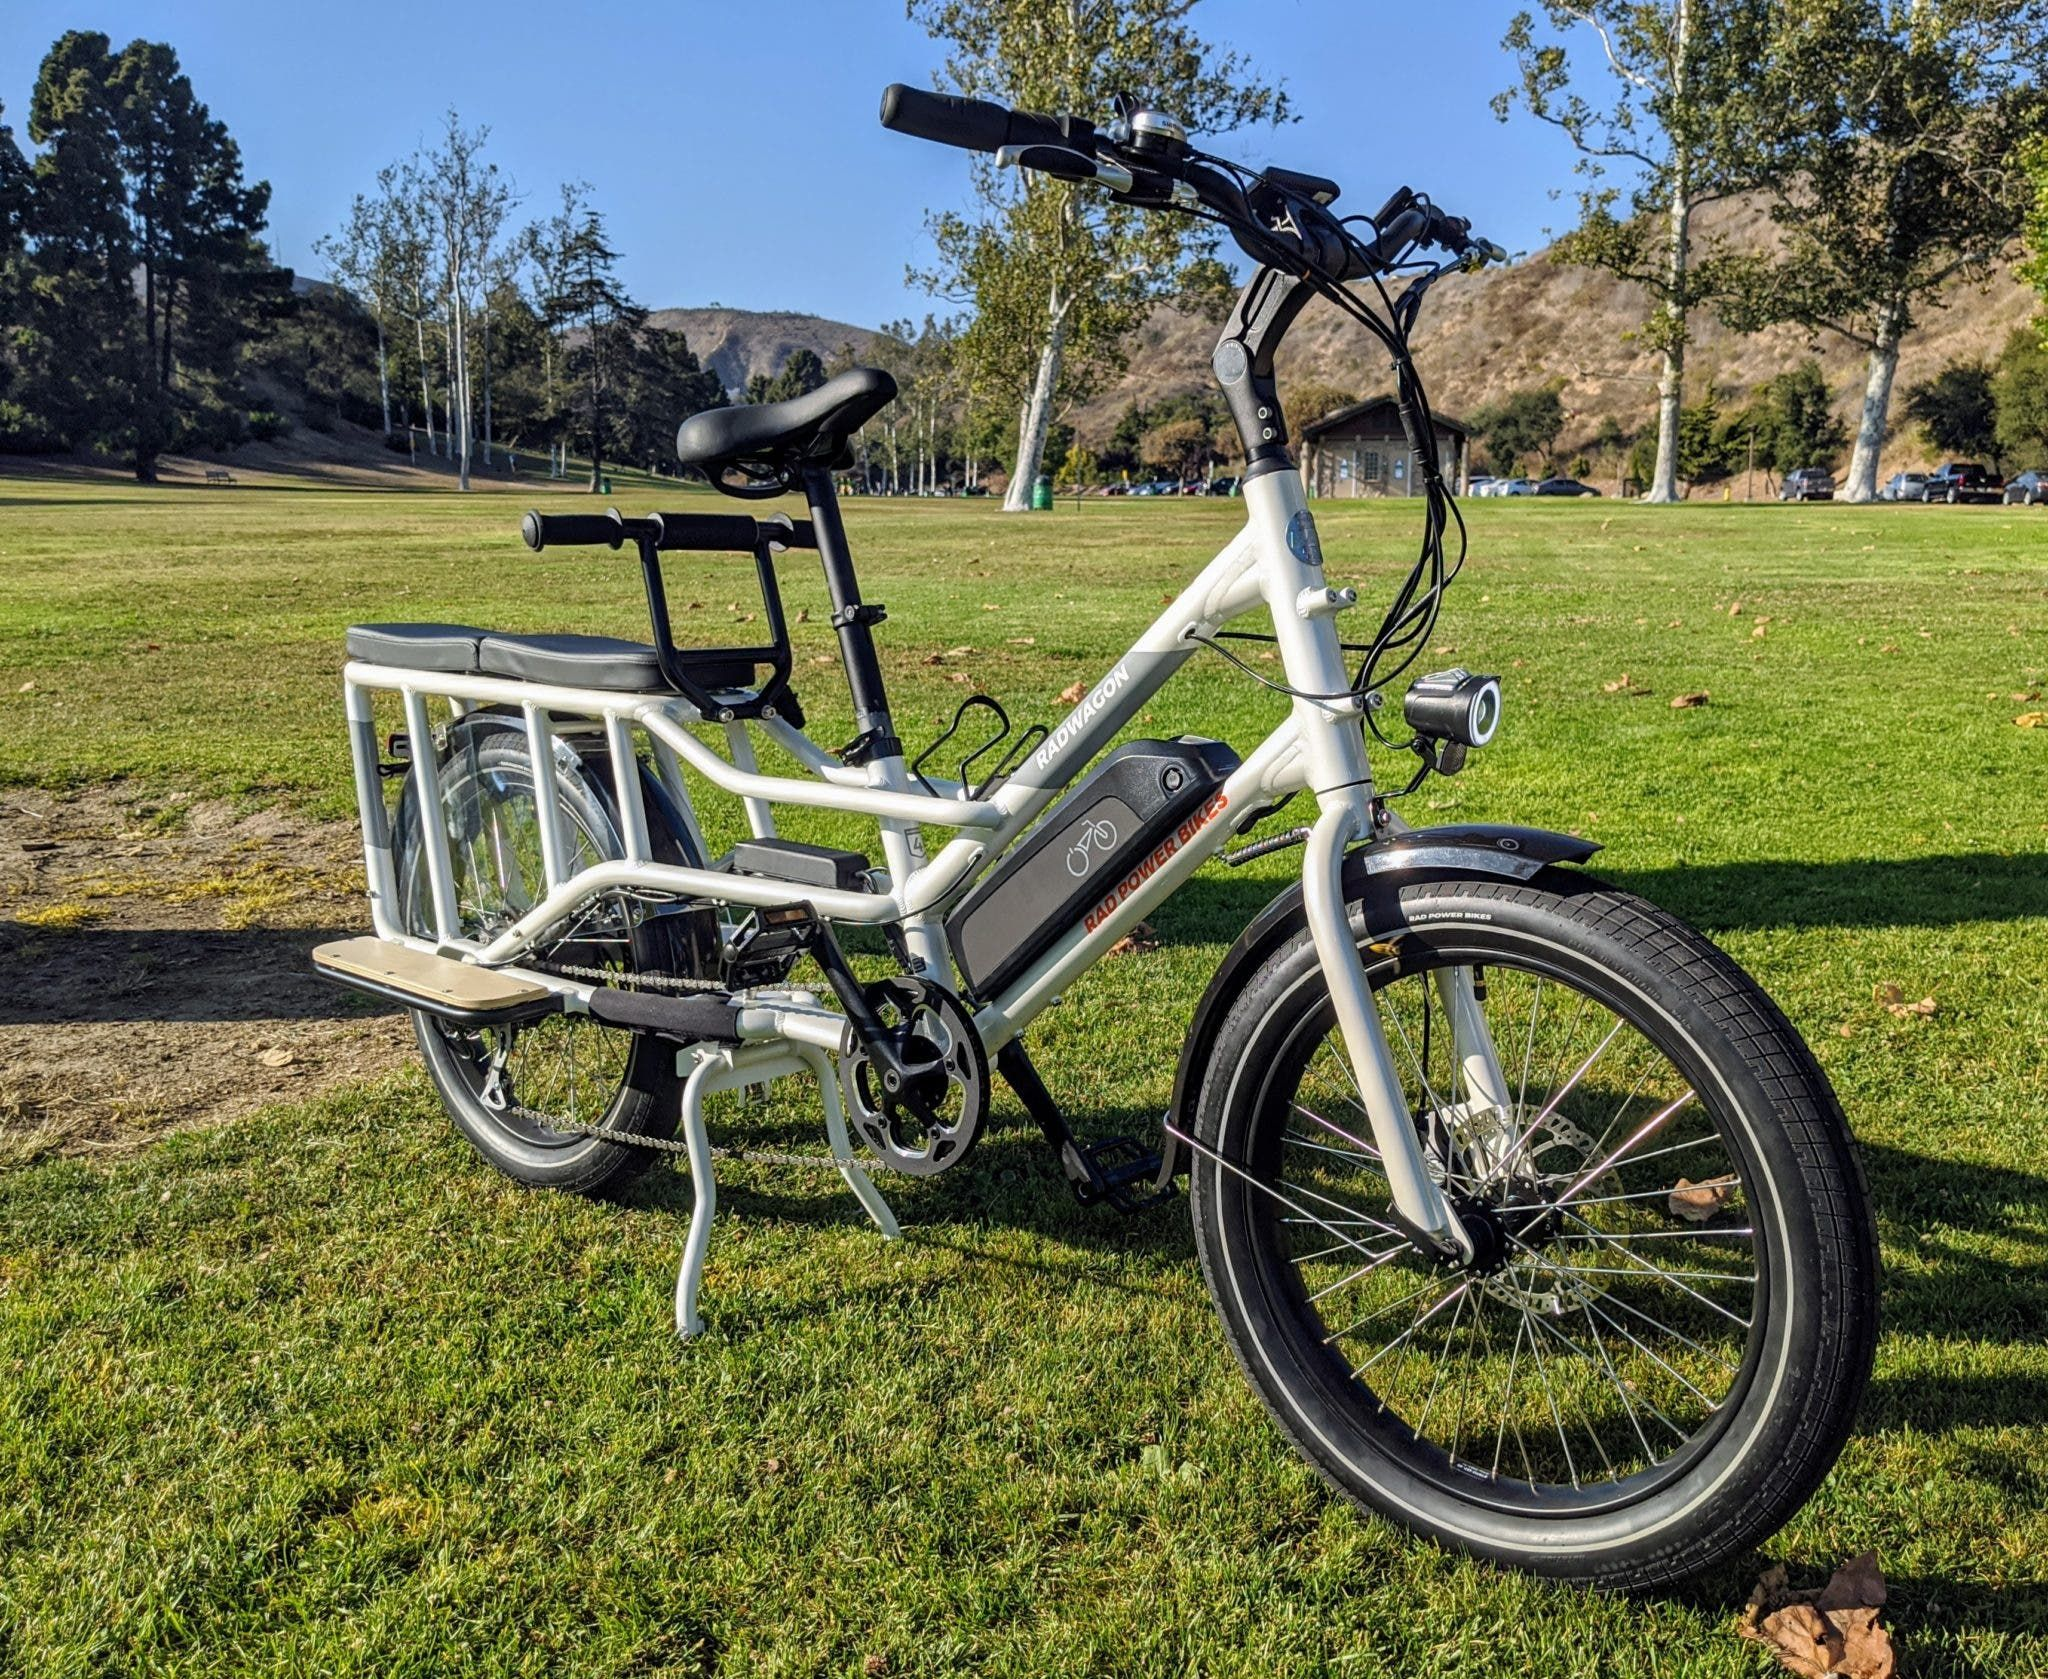 Pin By Cedric Moire On E Bike In 2020 Electric Cargo Bike Cargo Bike Bike